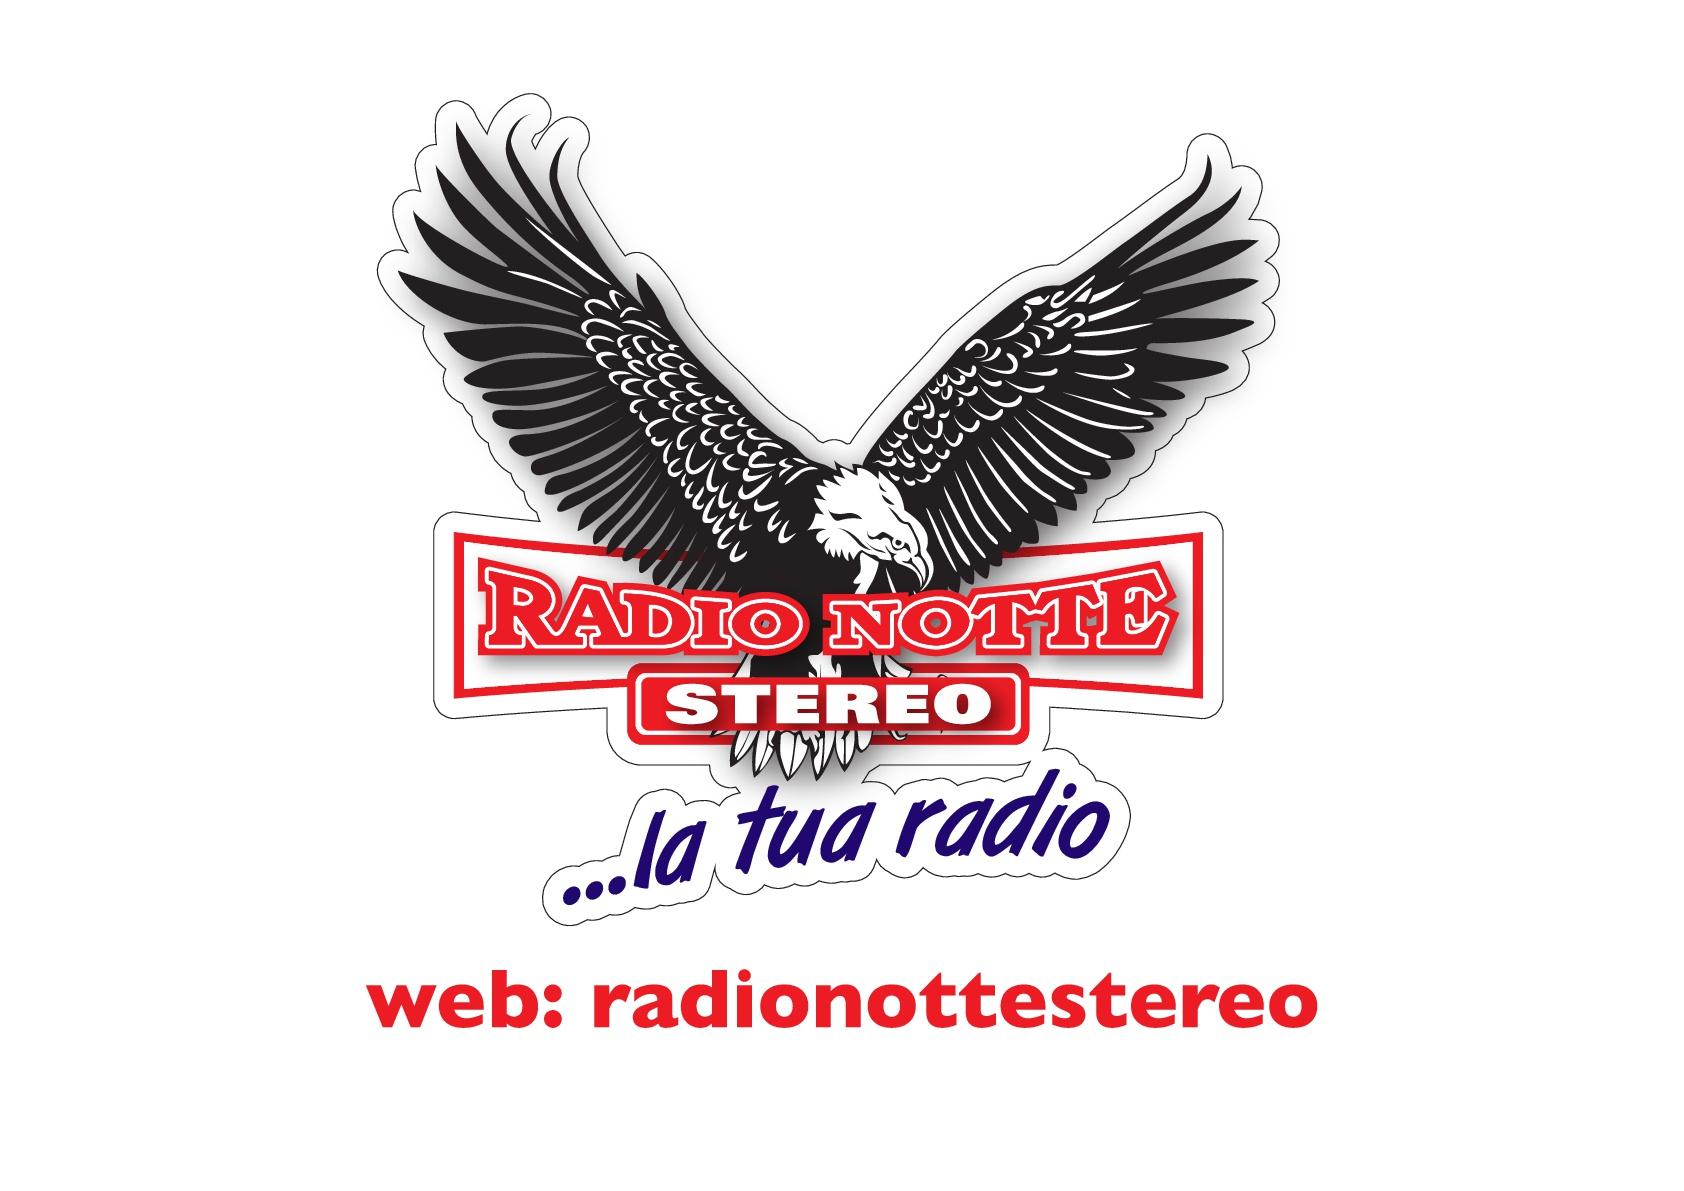 Radio Notte Stereo